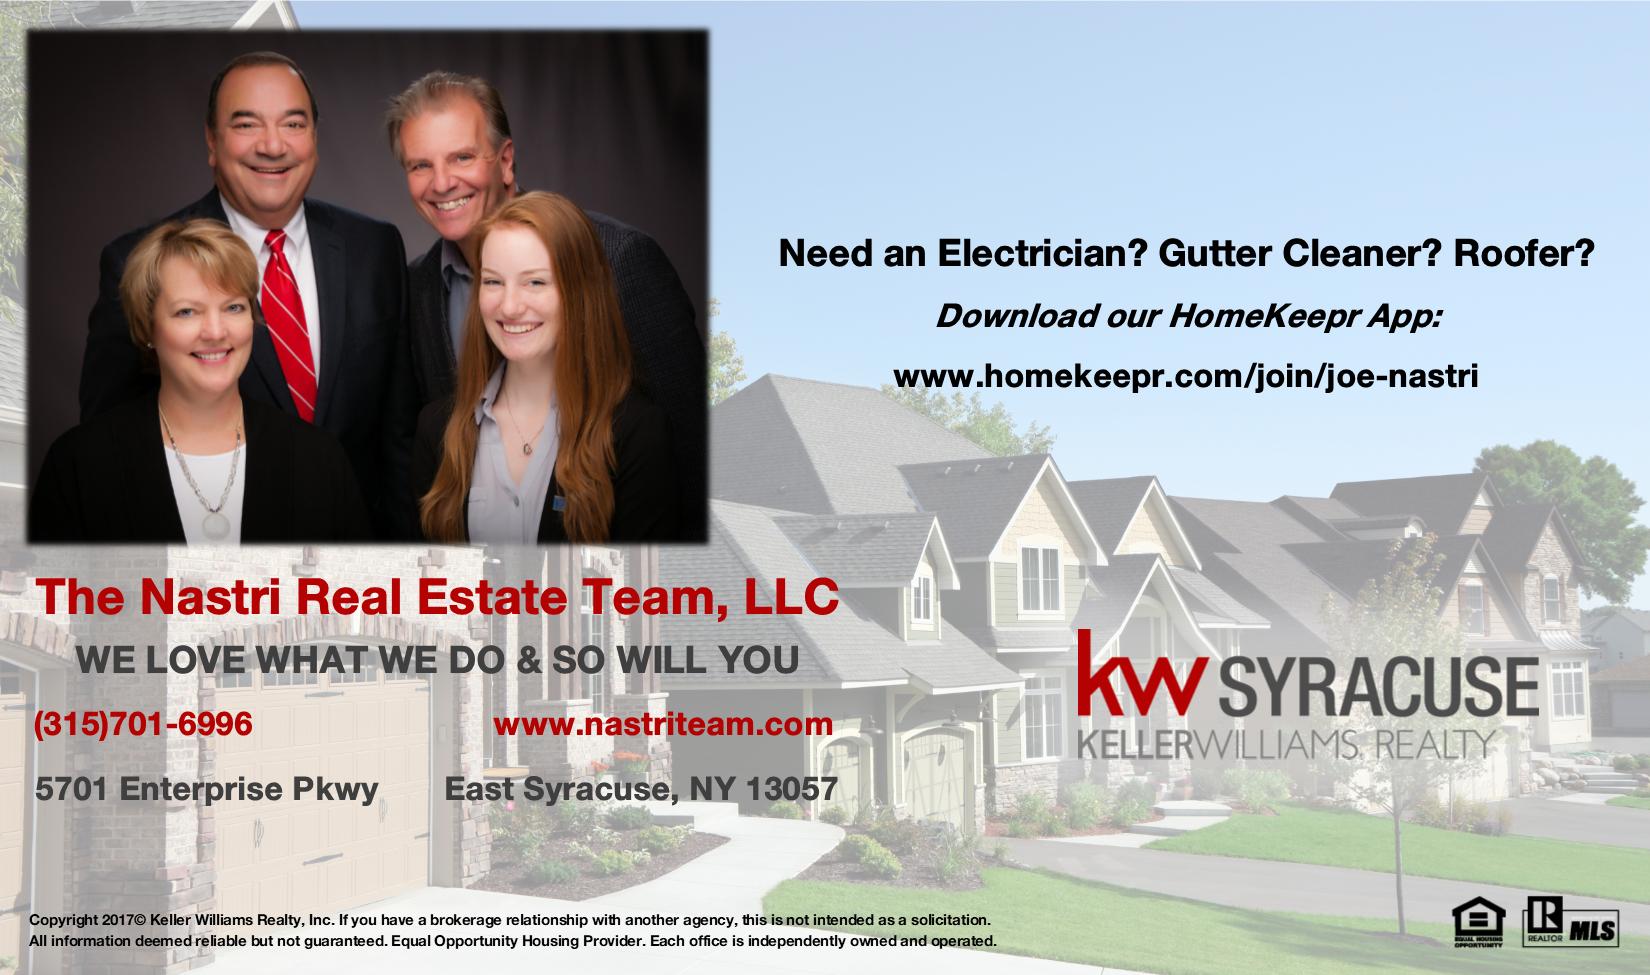 The Nastri Real Estate Team, LLC